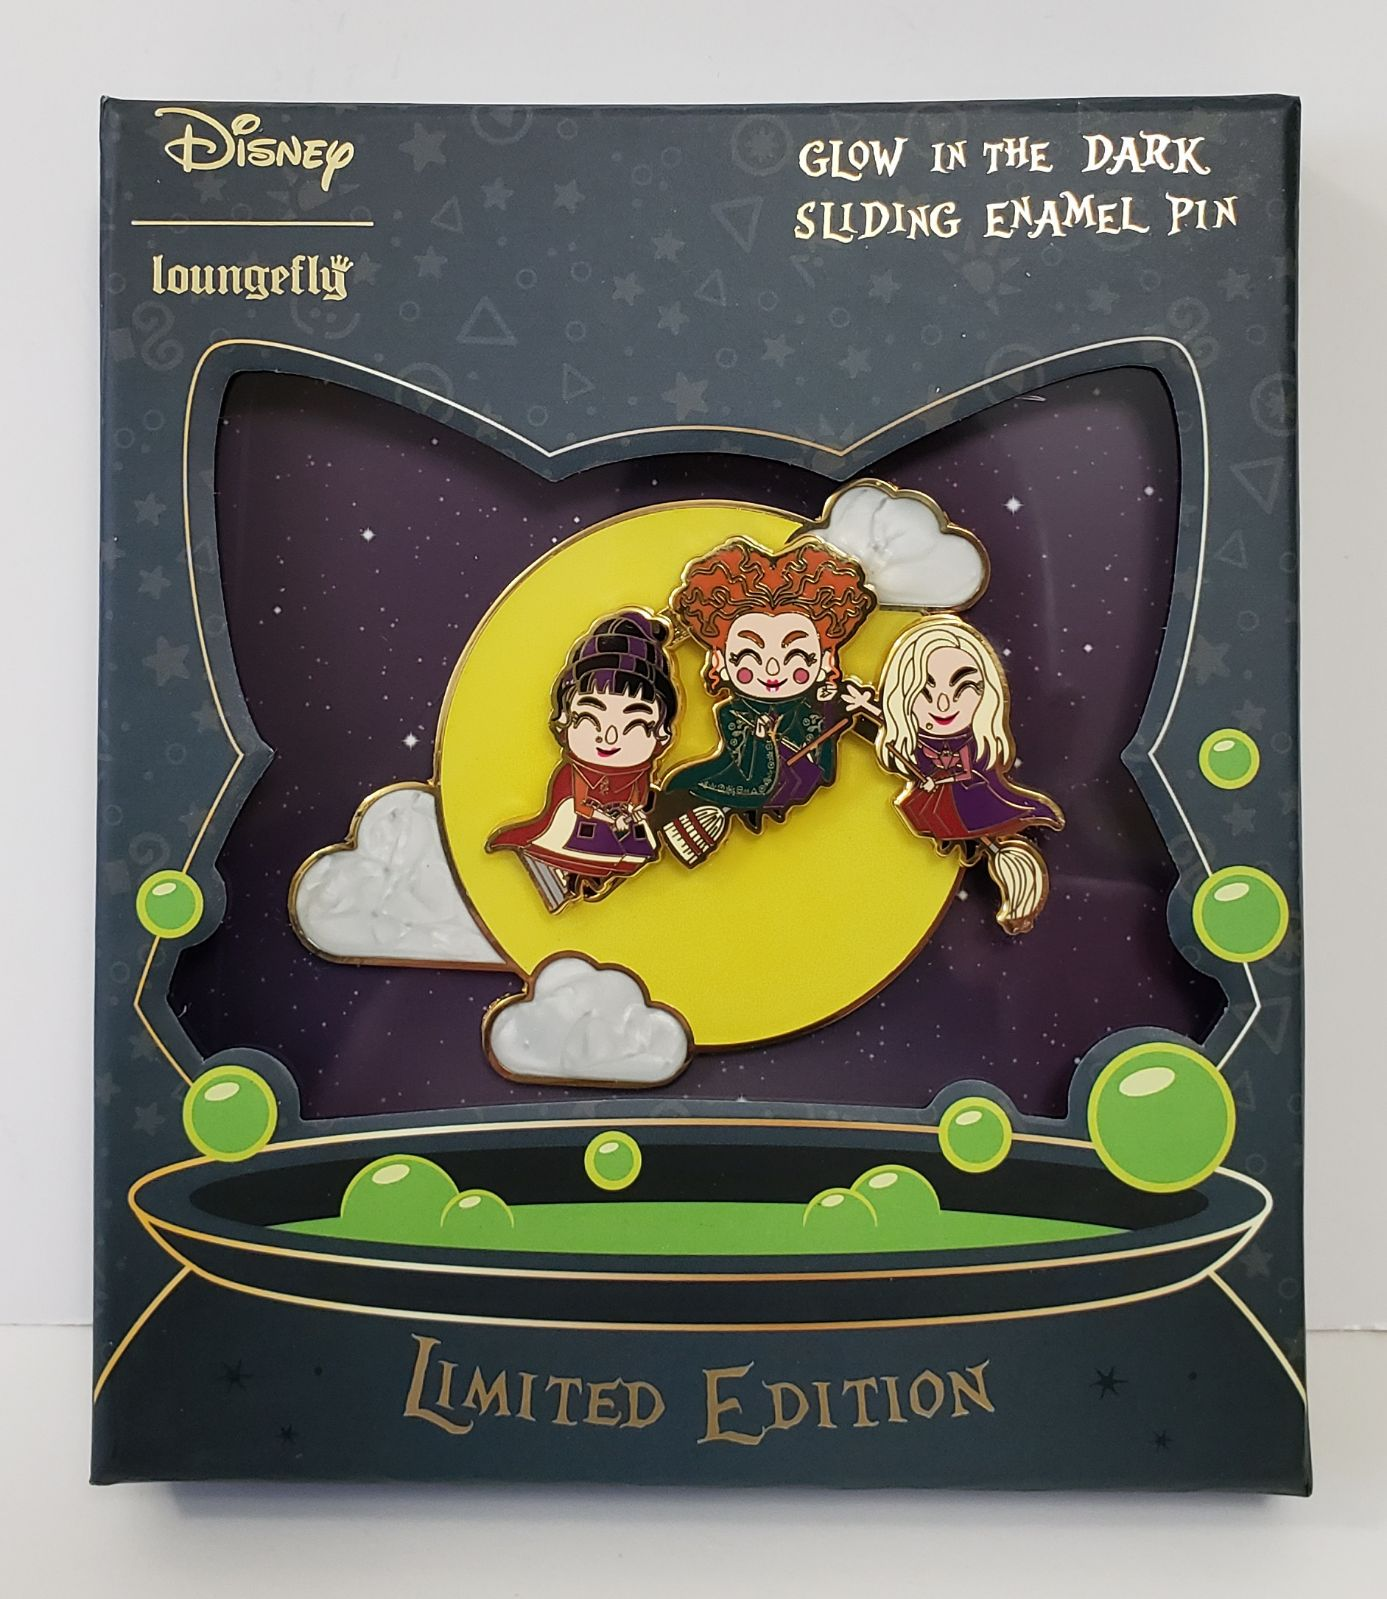 Loungefly Disney Hocus Pocus GITD LE Pin